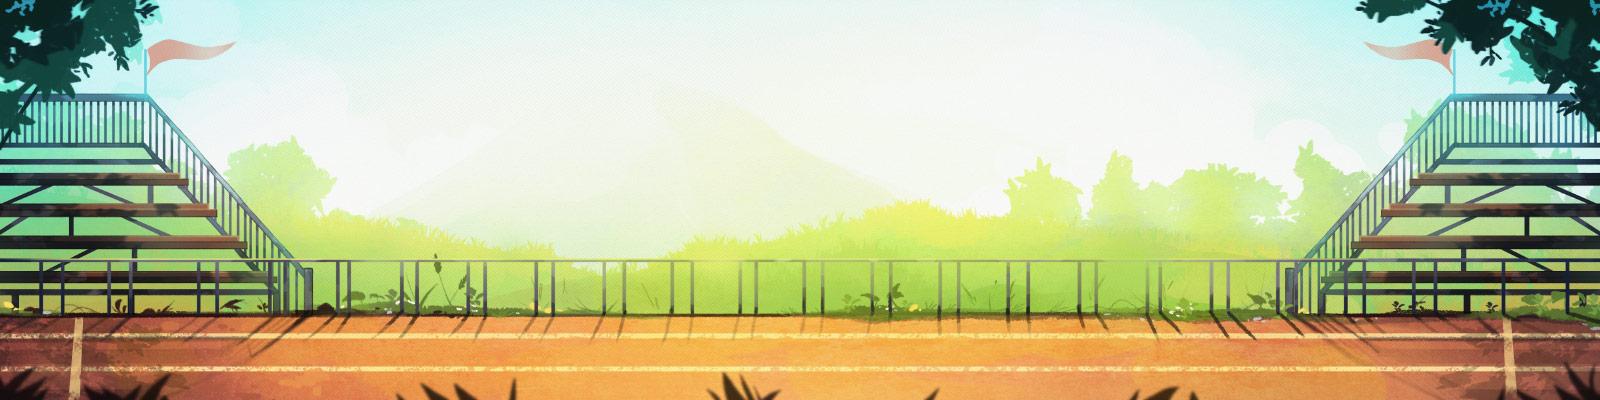 http://transformice.com/images/x_transformice/x_maps/x_rentree2015/map-sport.jpg